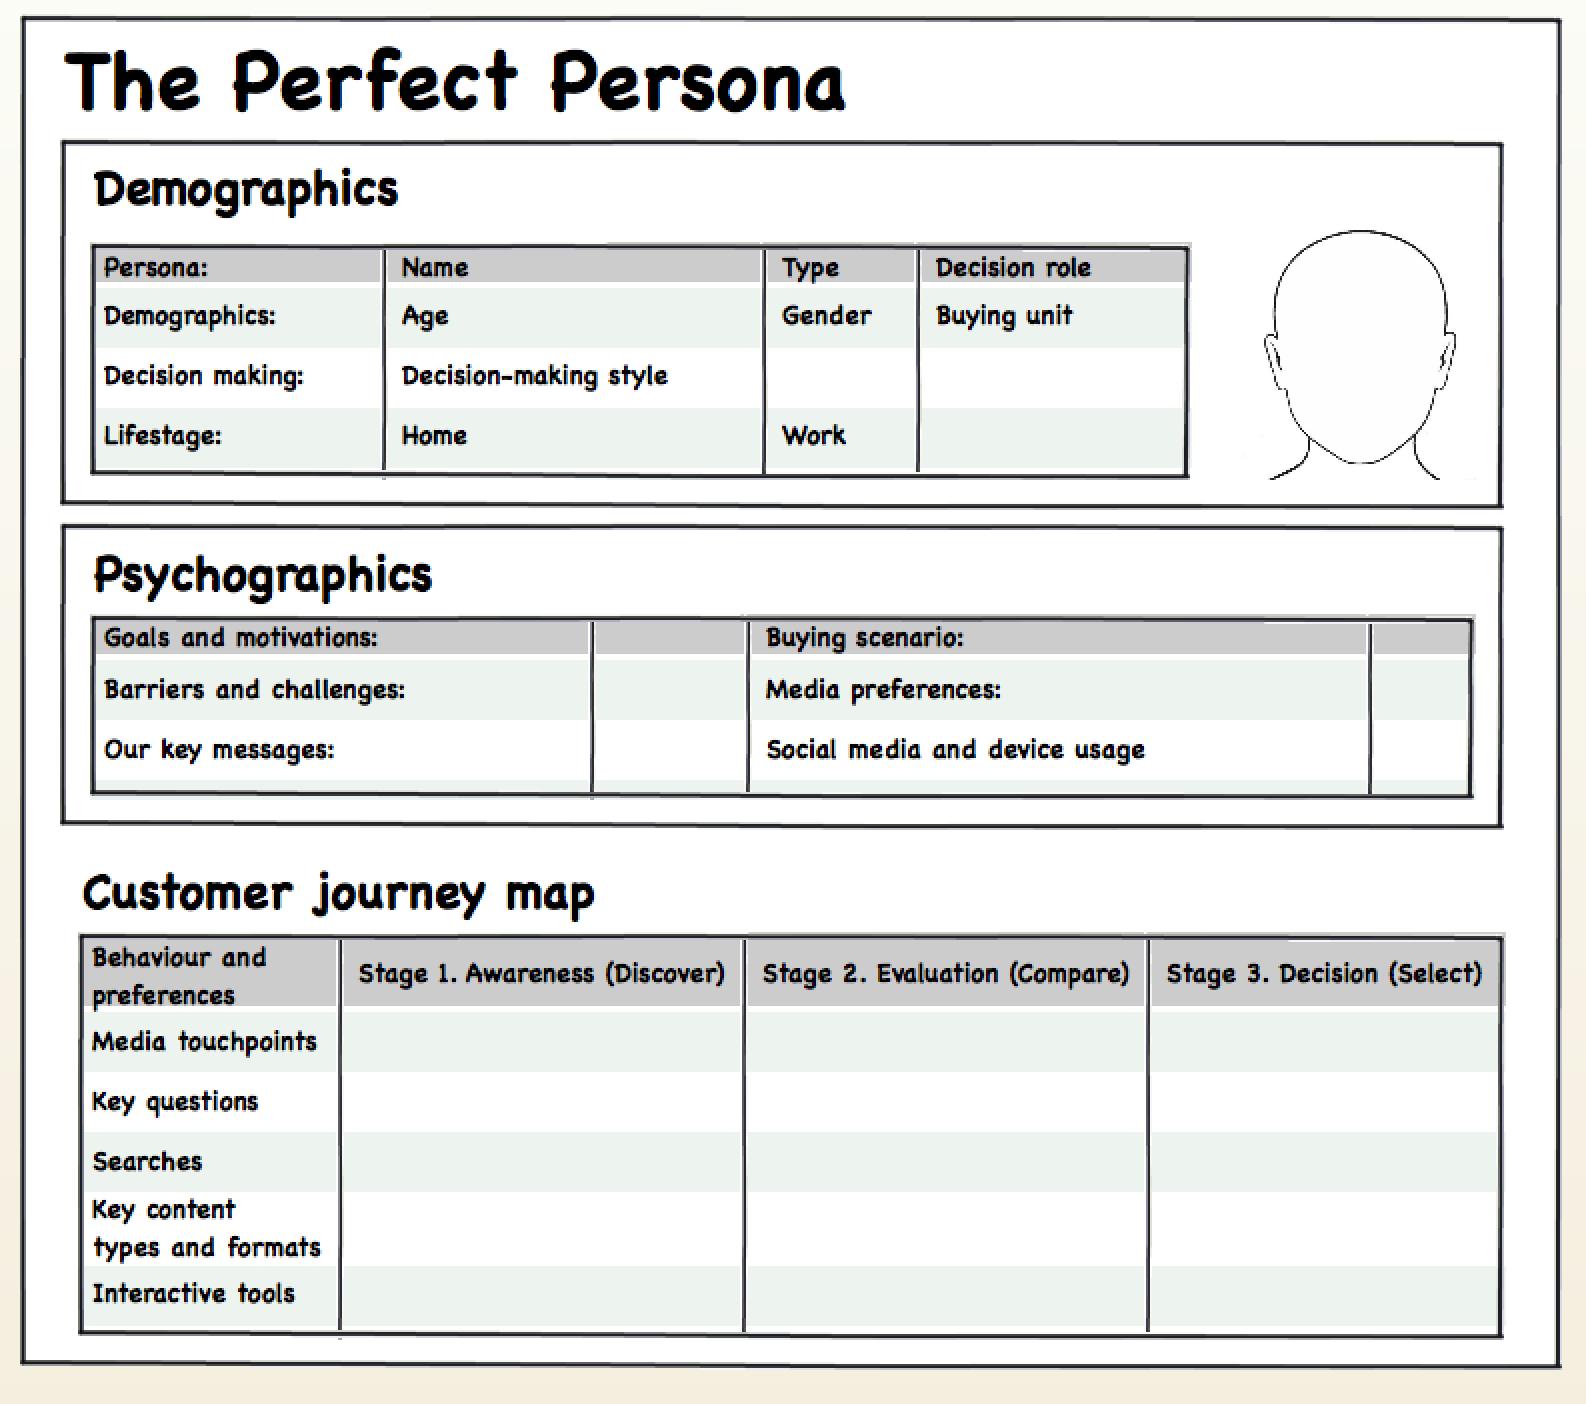 Model persona layout